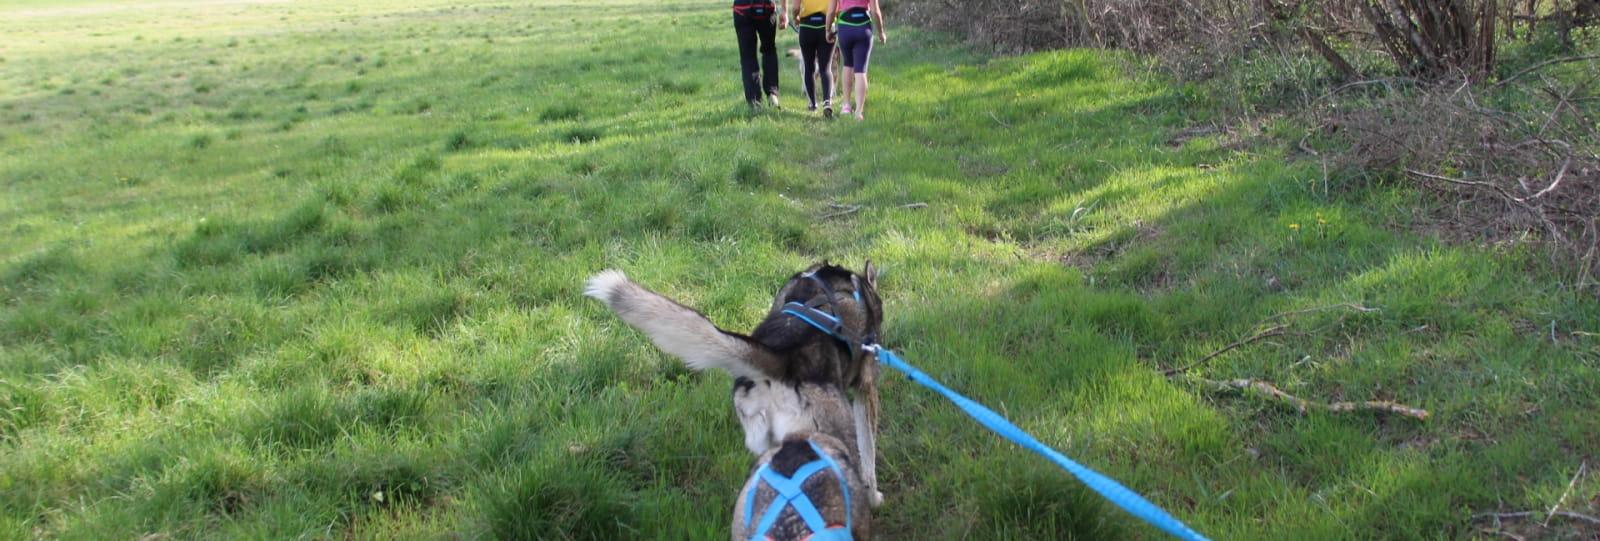 Wood track - cani-rando découverte